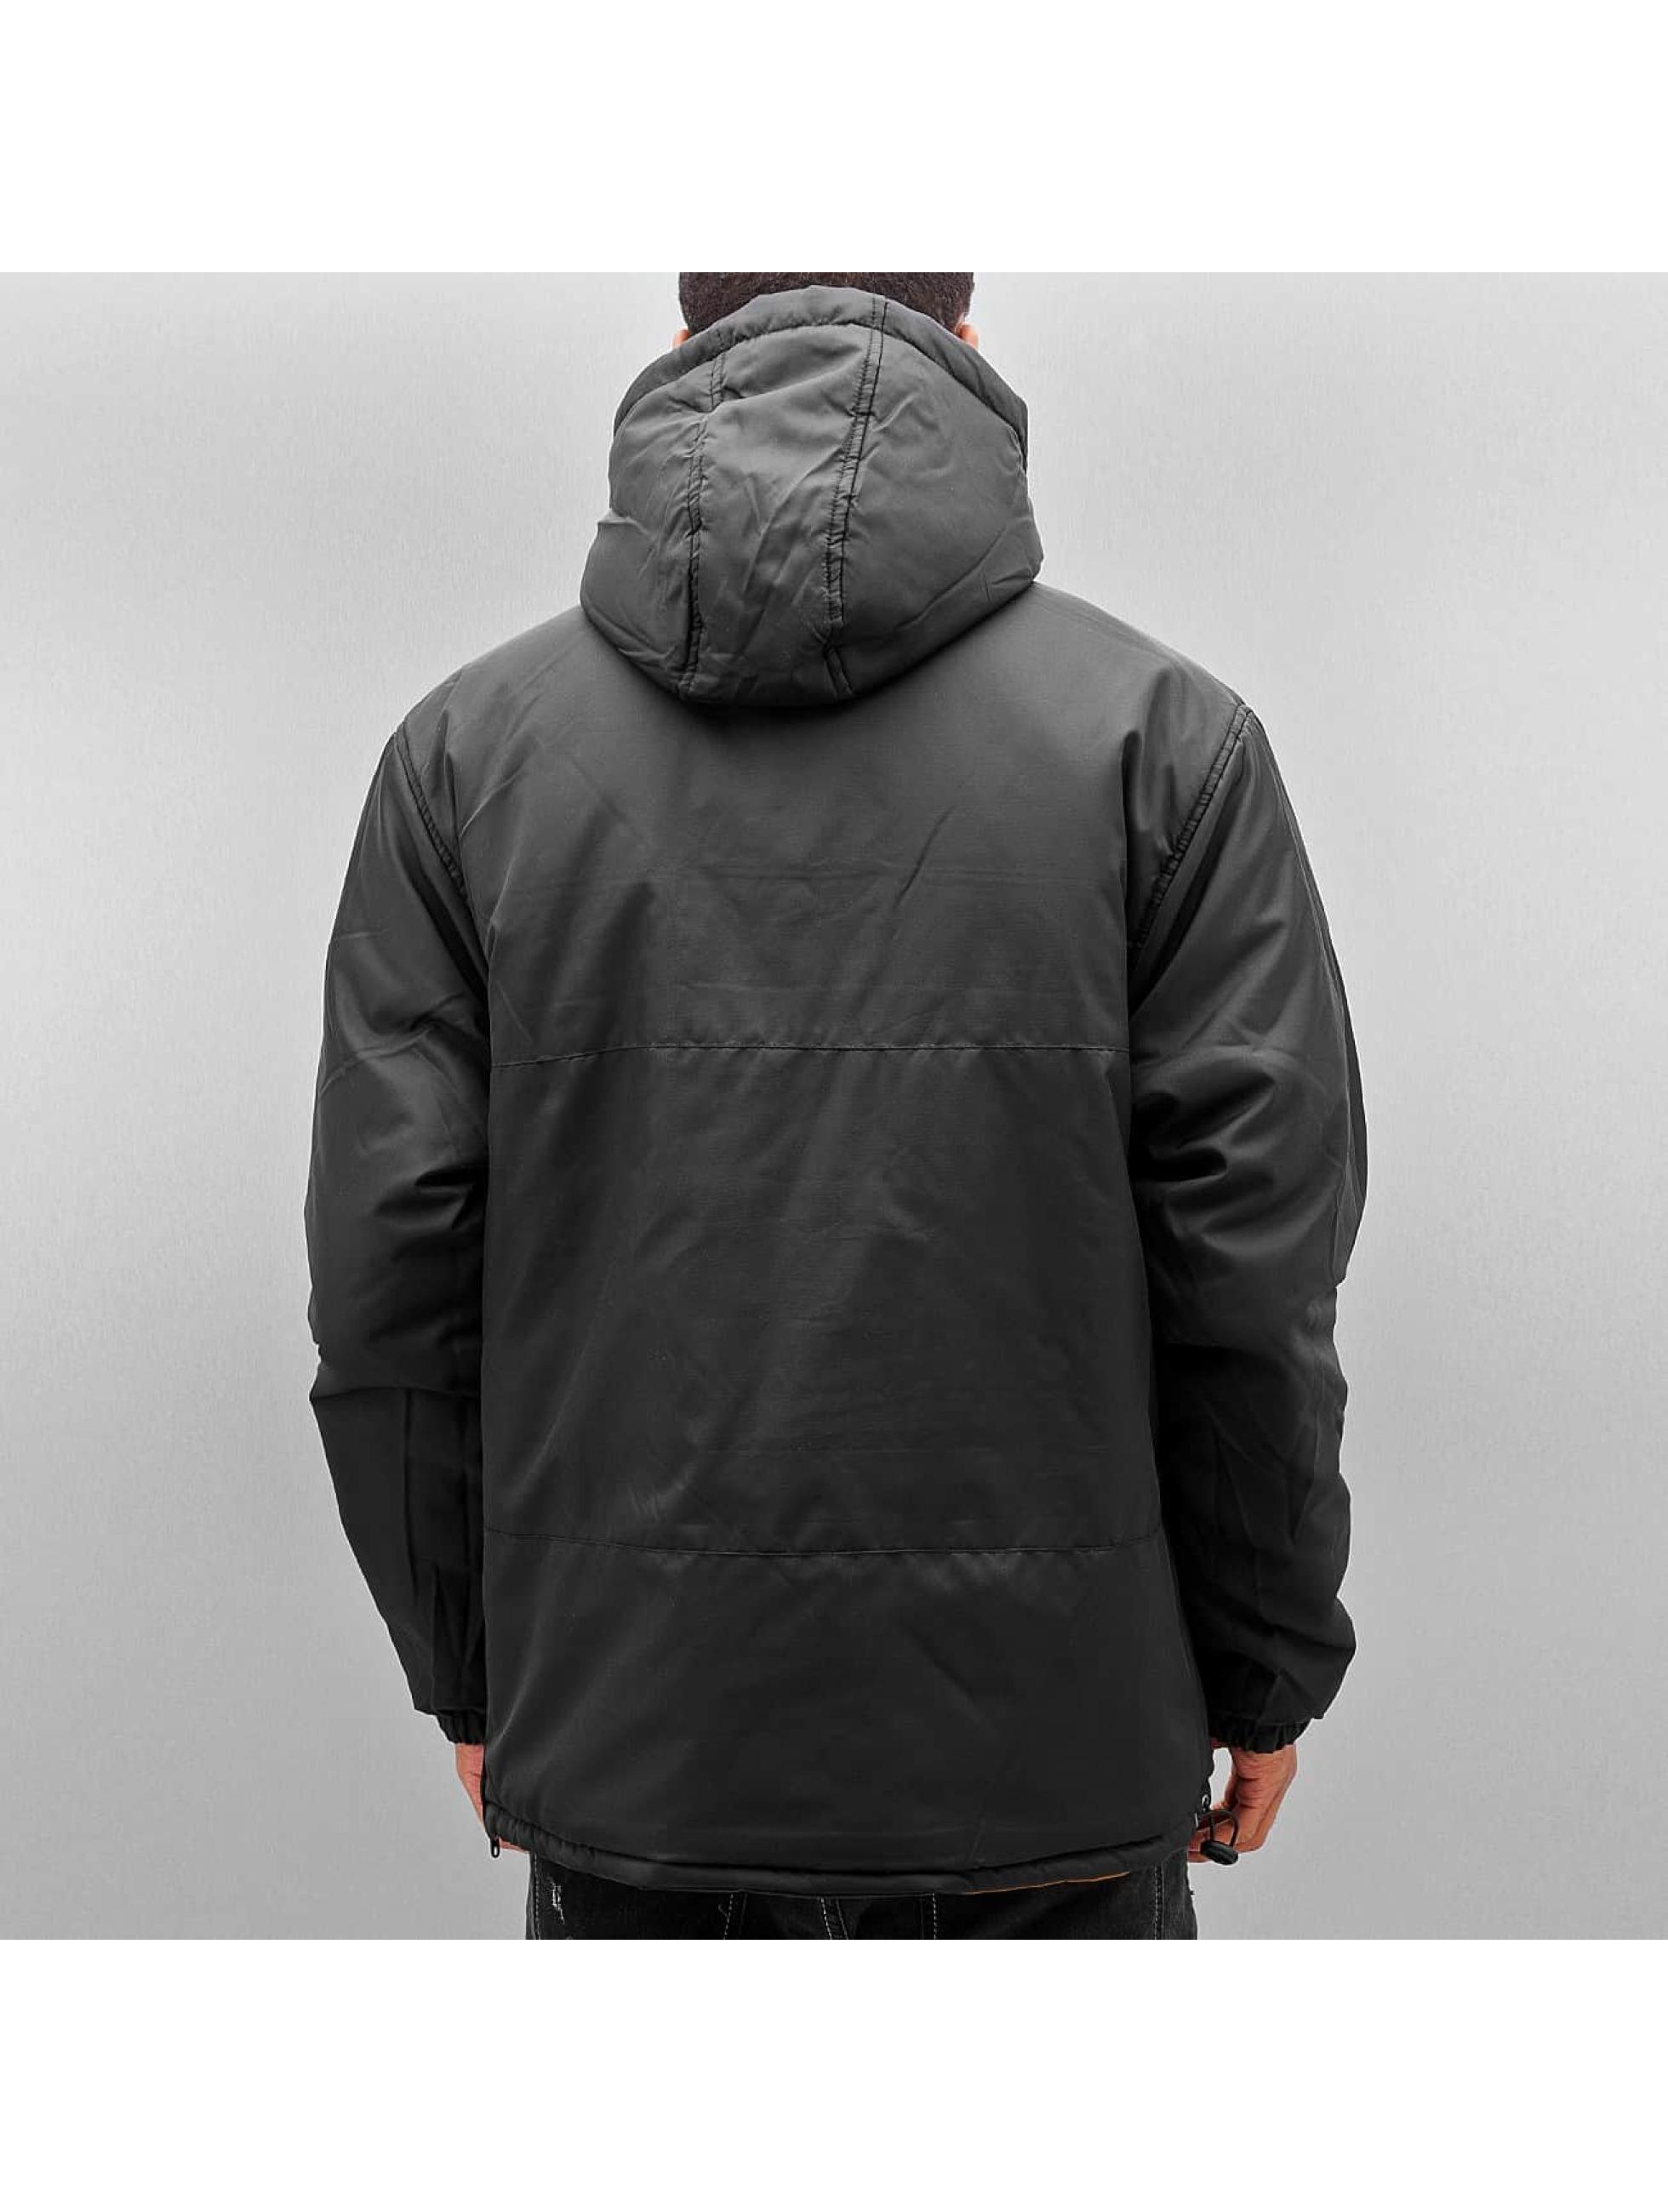 Grimey Wear Transitional Jackets Smoky Alley Reversible kamuflasje